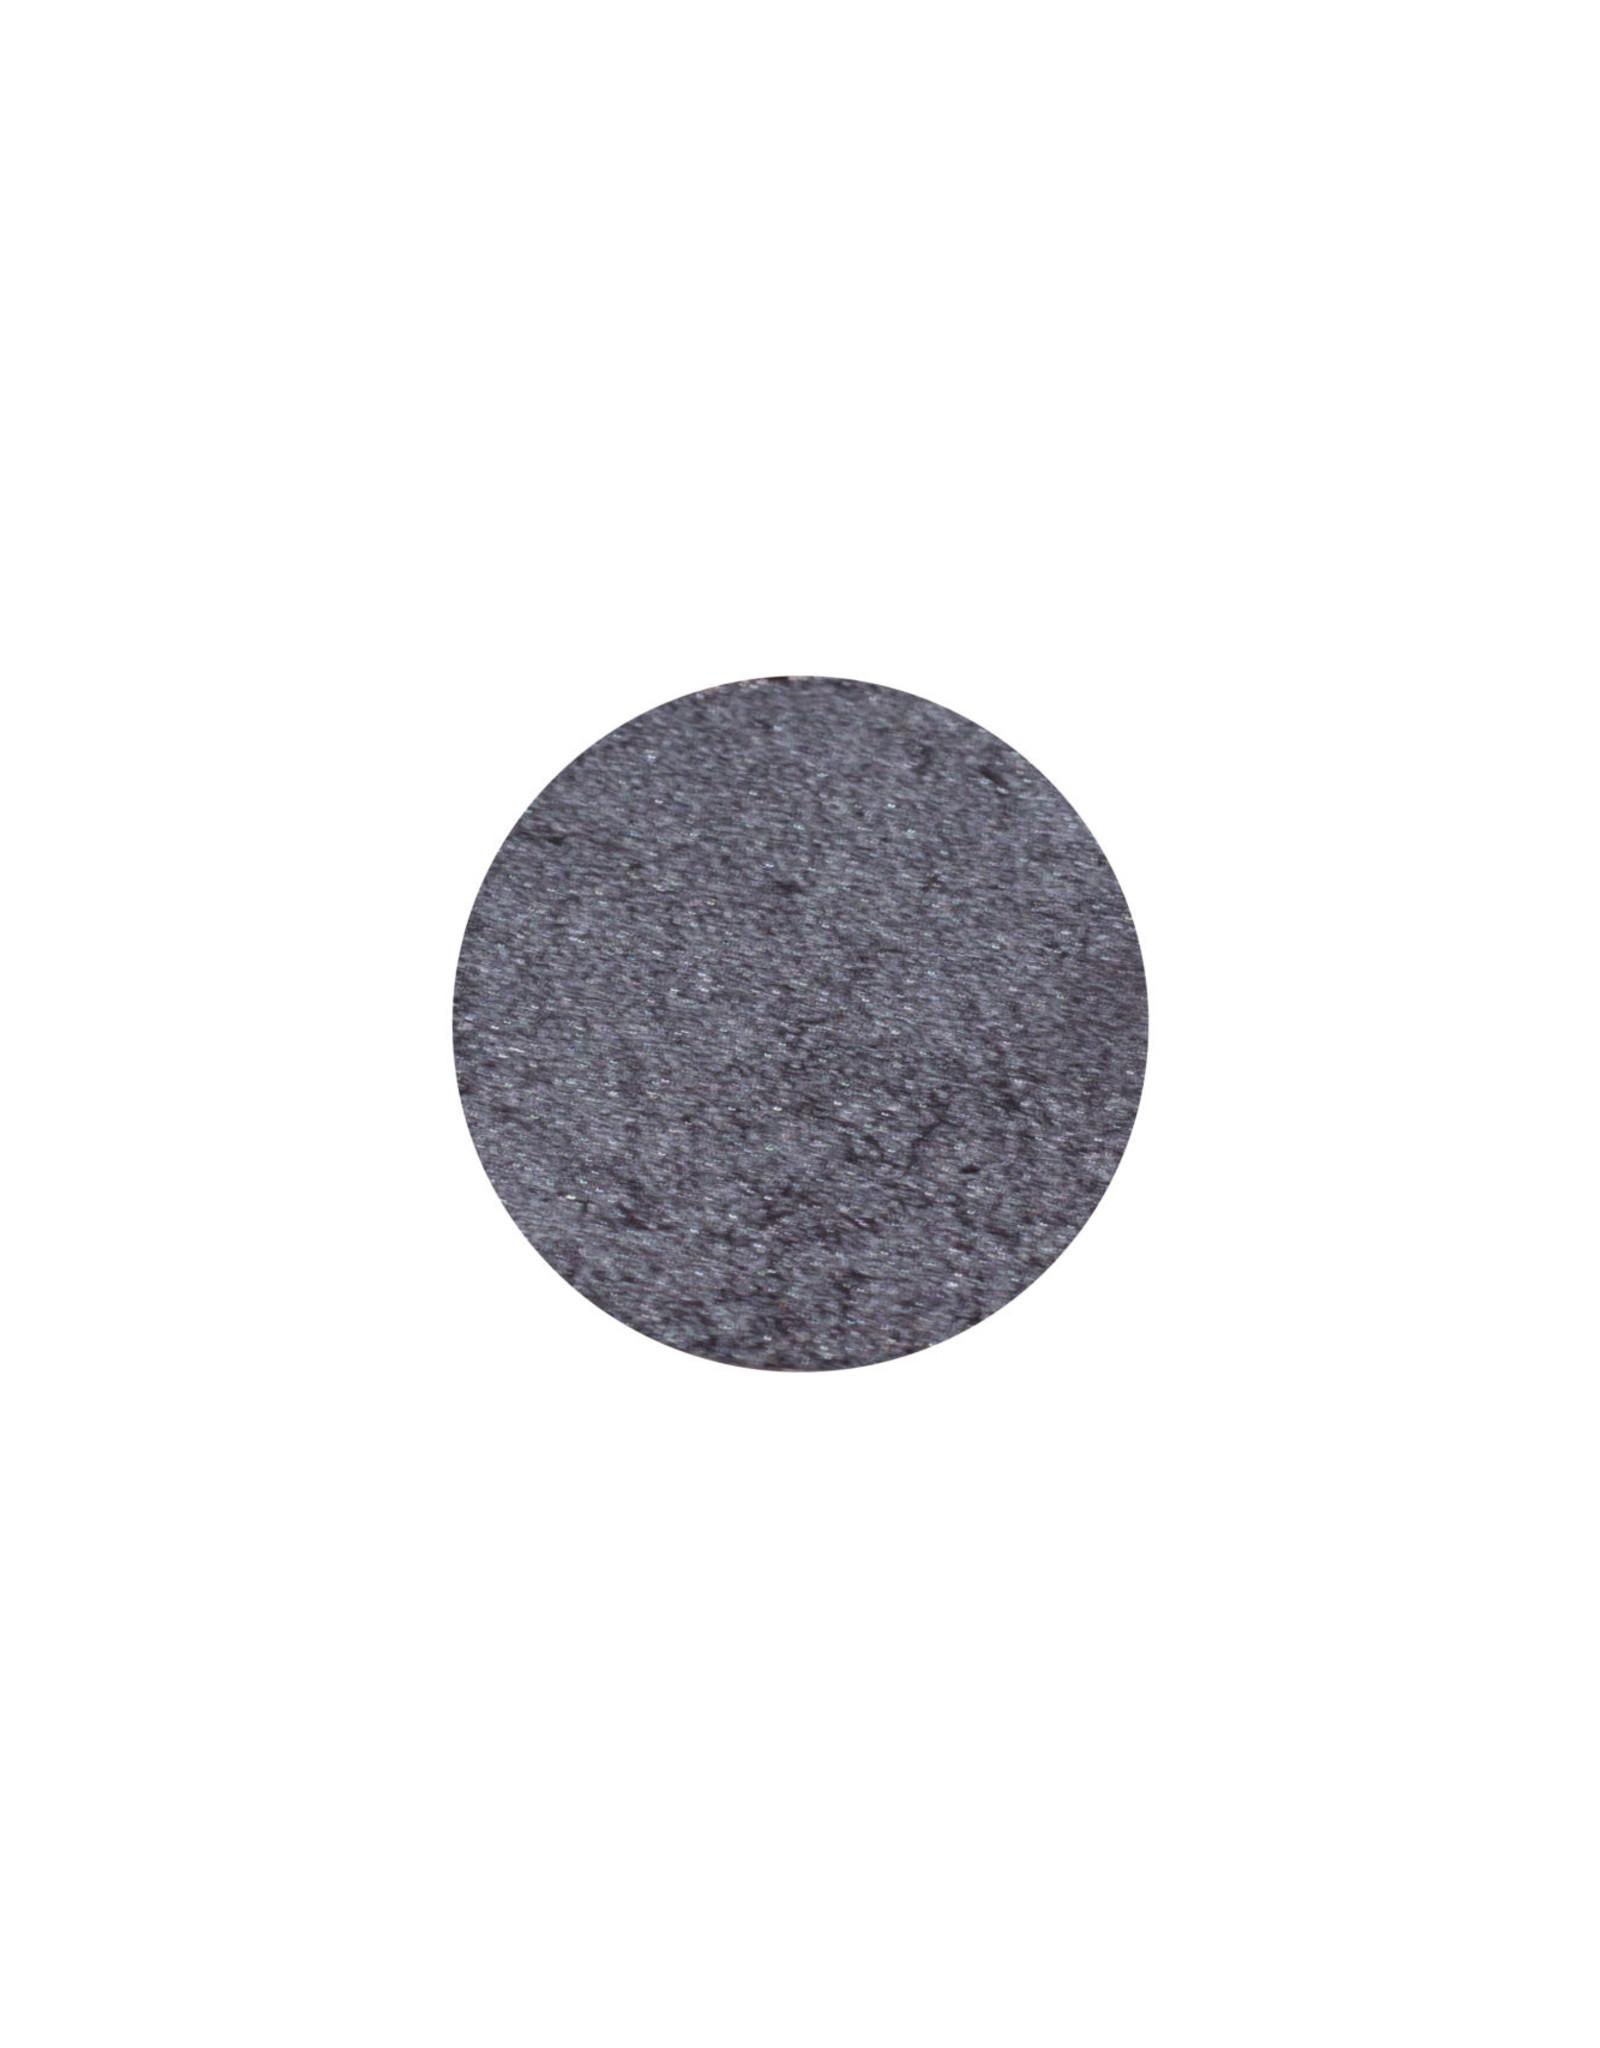 CentpurCent Refillable Compact Eye Shadow Rêve - CentpurCent